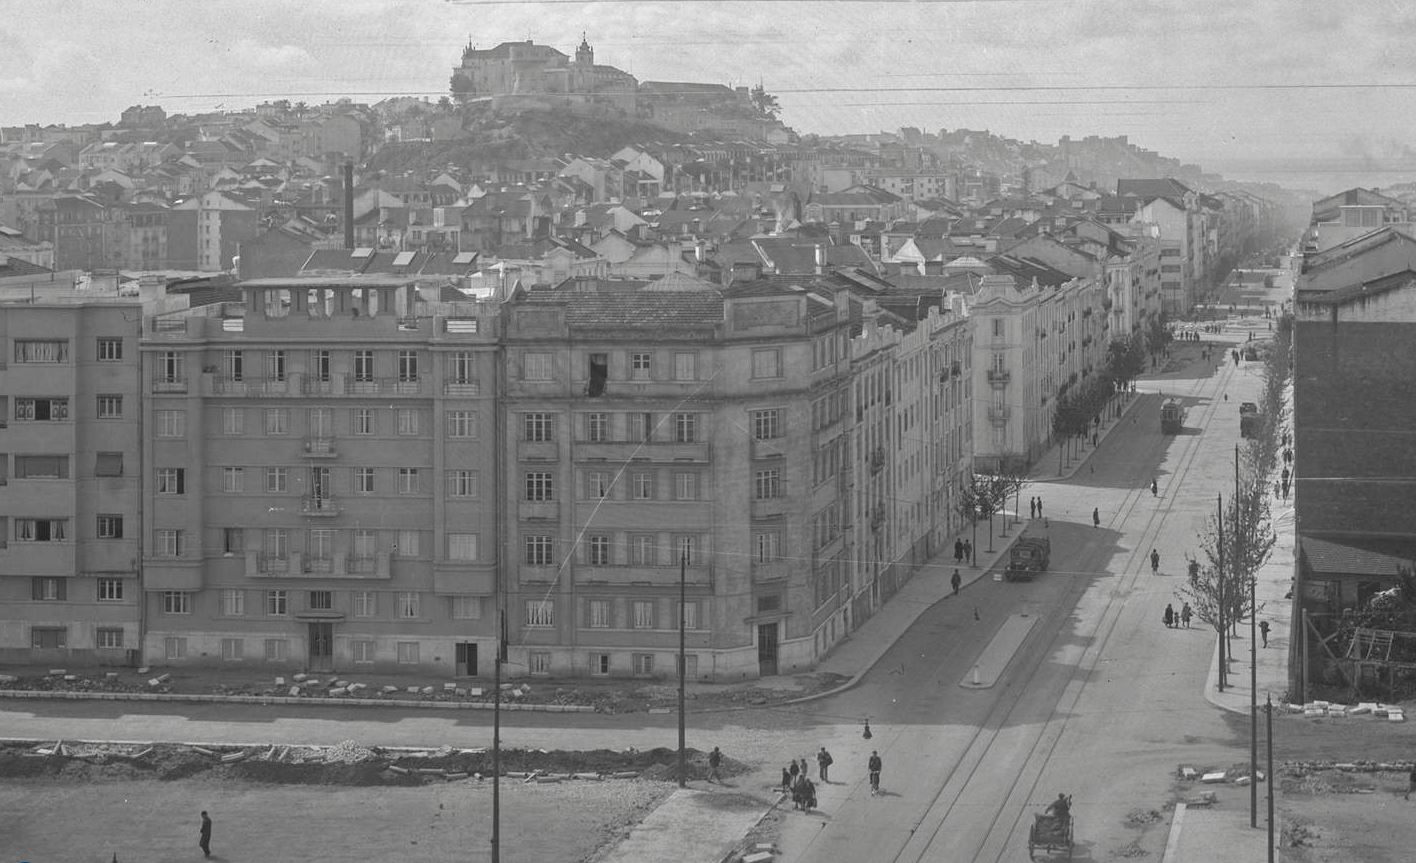 Avenida Almirante Reis, Lisboa (Garcia Nunes, c. 1940)